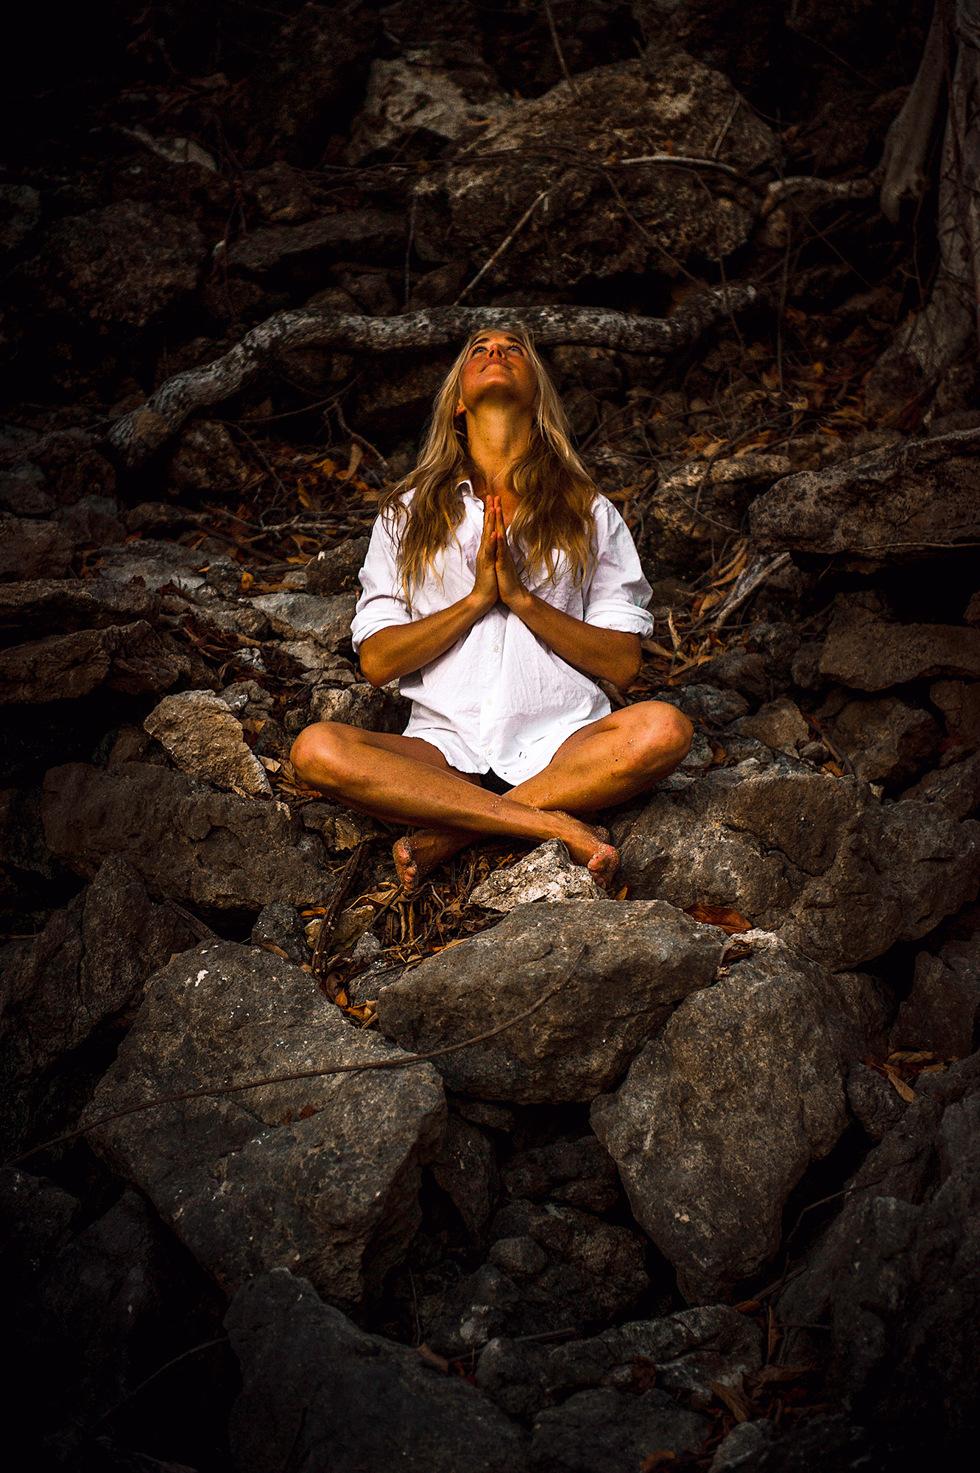 josefine bengtsson. Kan man tävla i yoga